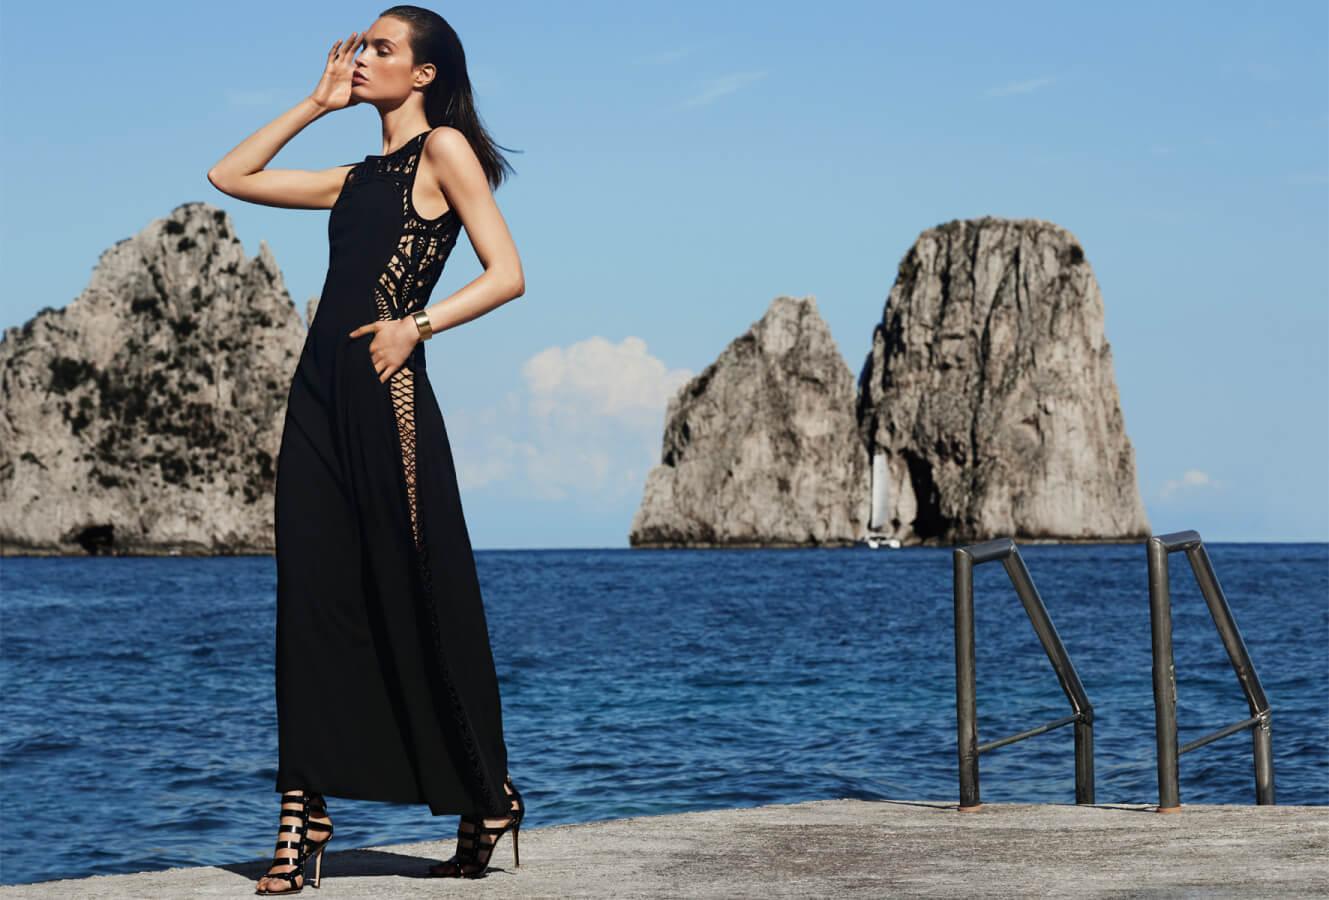 06_Alvaro_Beamud_Cortes_Air_France_Madame_Capri